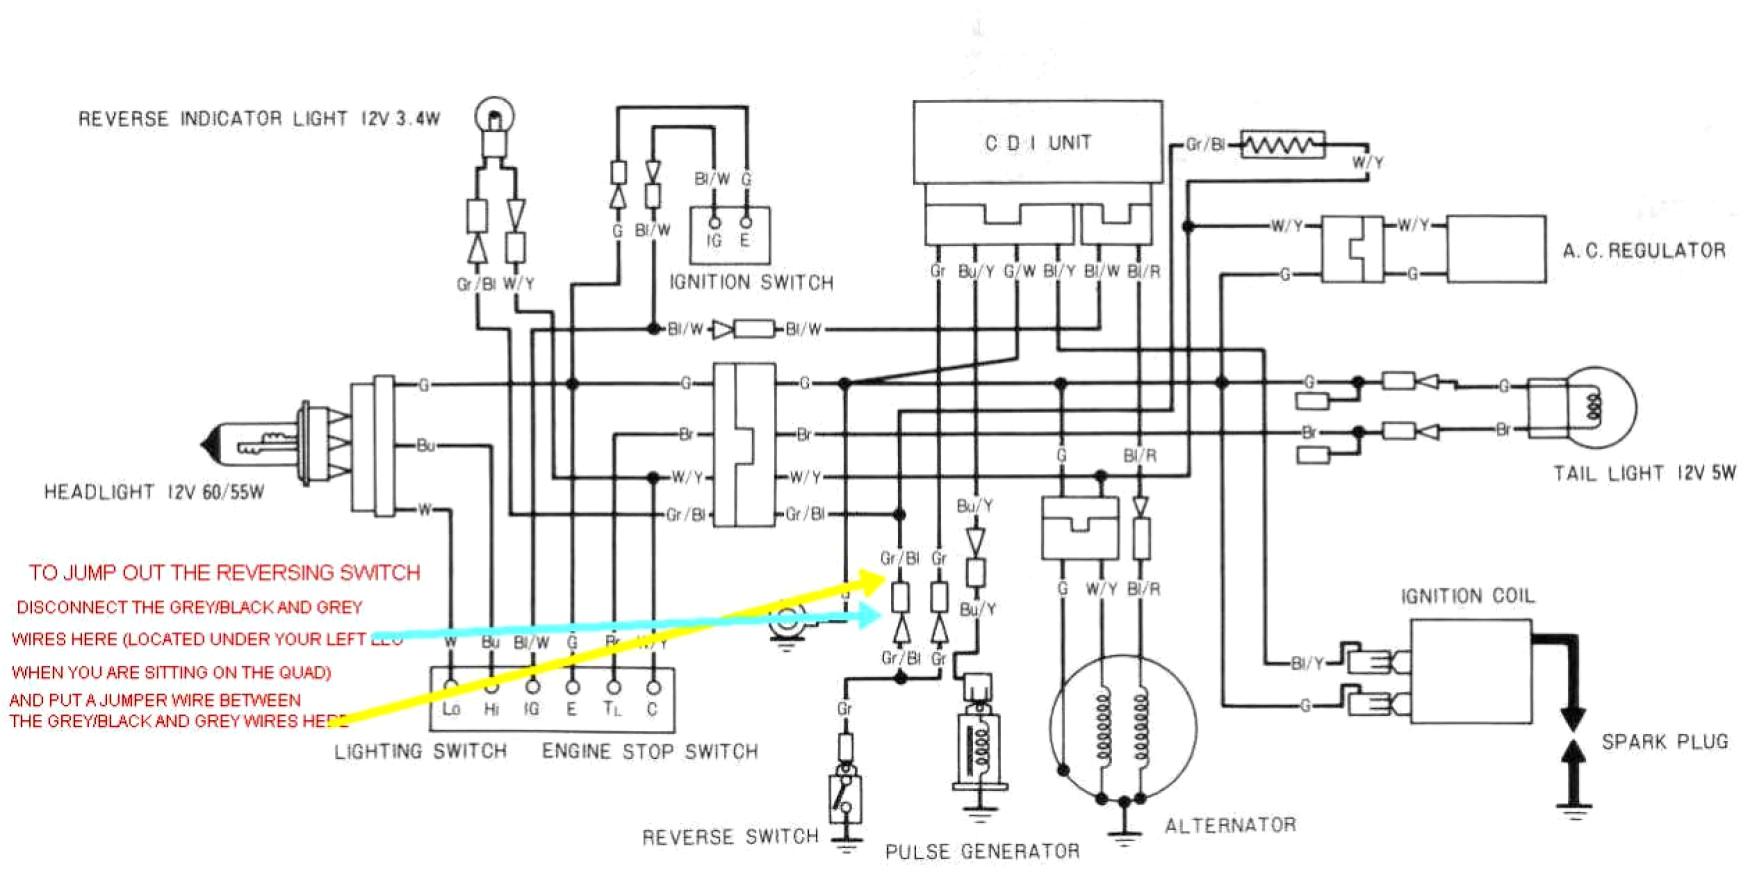 04 honda 250 ignition wiring wiring diagram mega 04 honda 250 ignition wiring